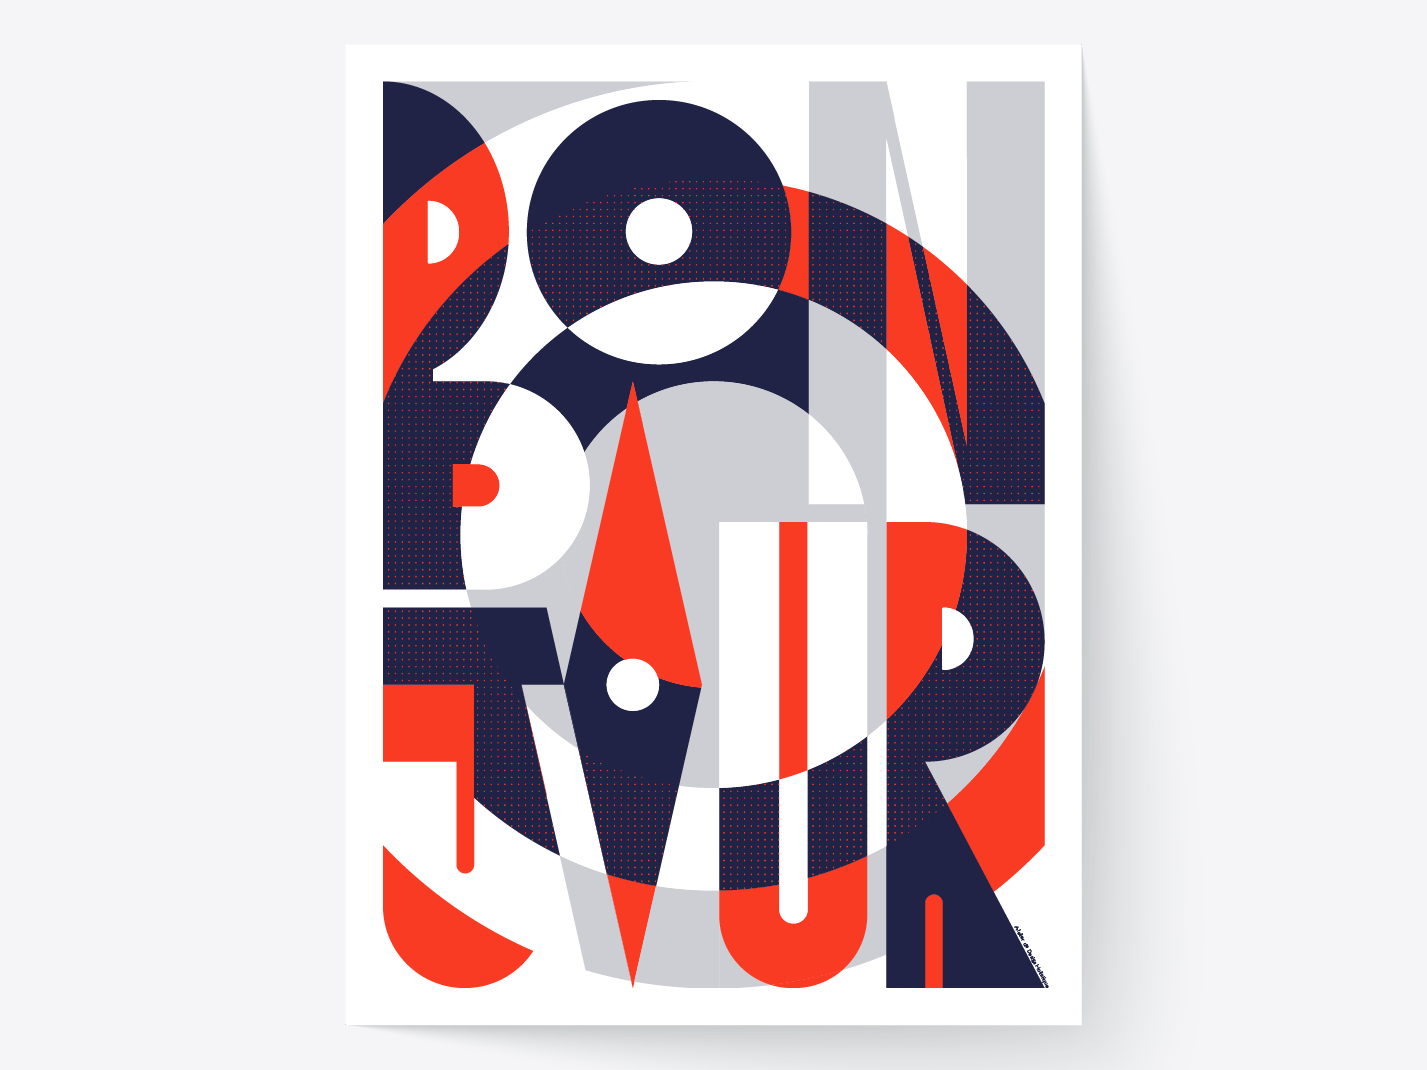 Bonjour poster art graphic artist typographie poster geometric visual art illustration screenprint graphic  design lettering artist typo letter typography